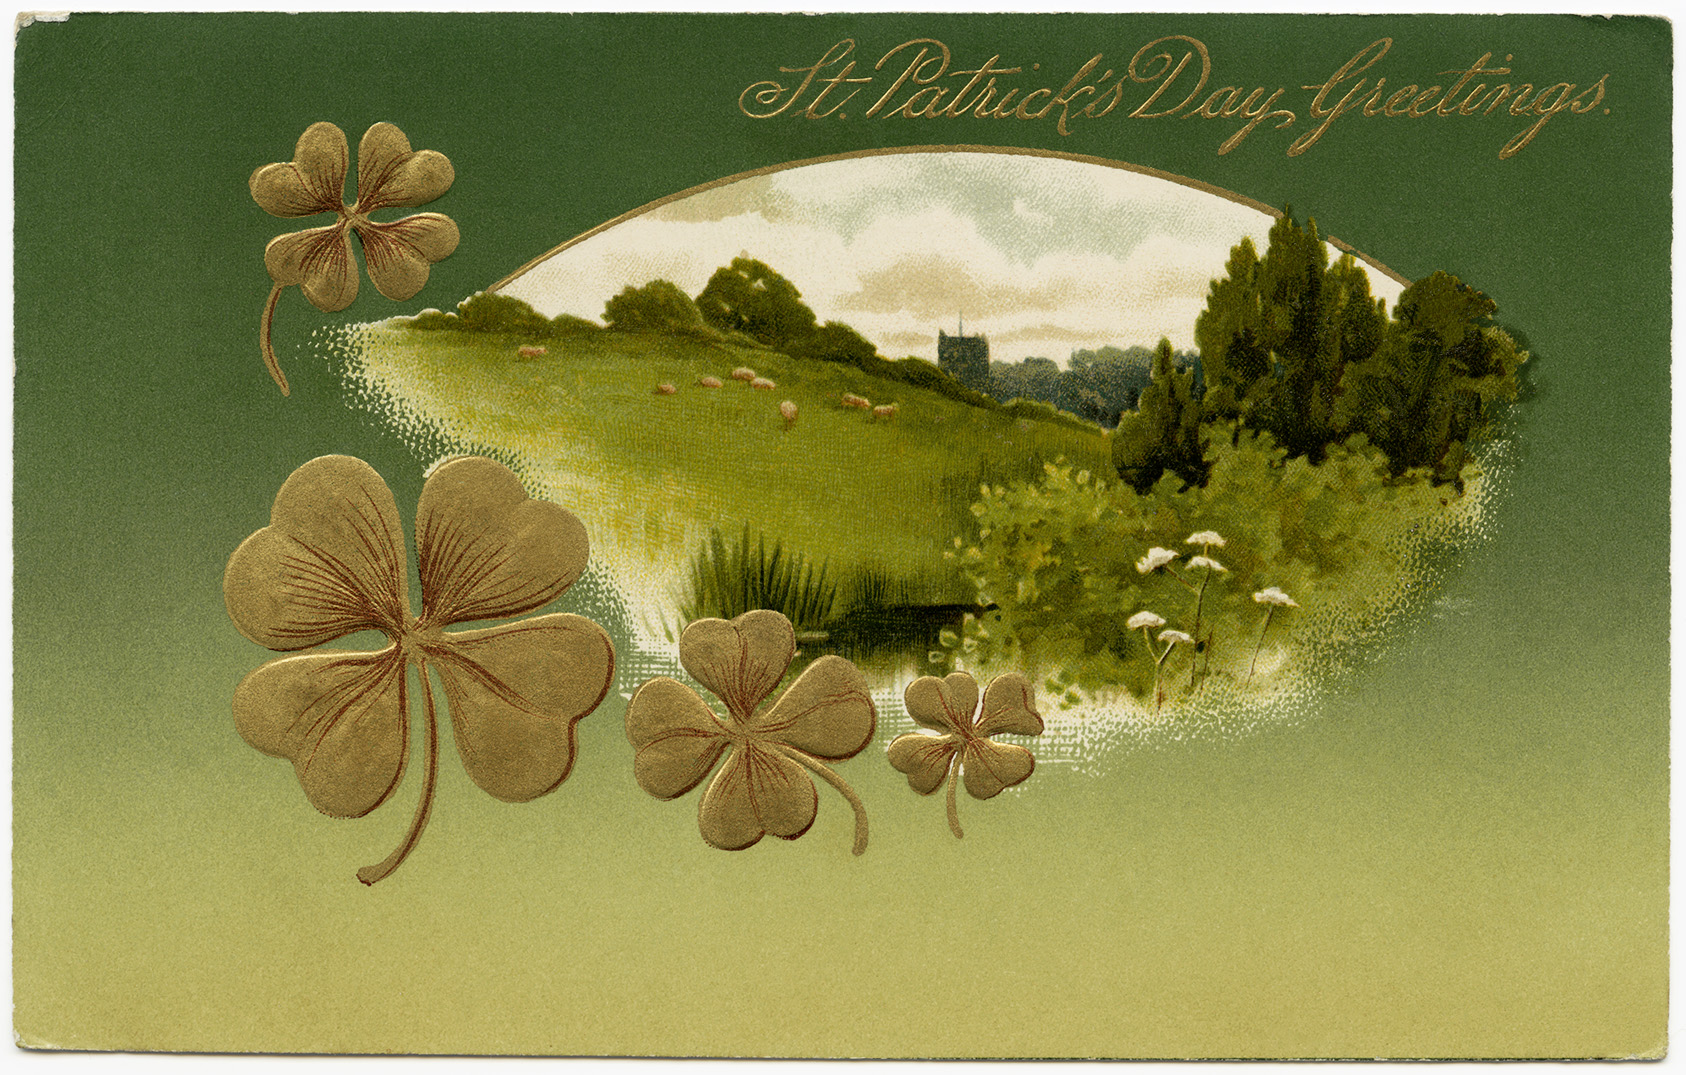 Free Vintage Image ~ St Patrick\'s Day Postcard.